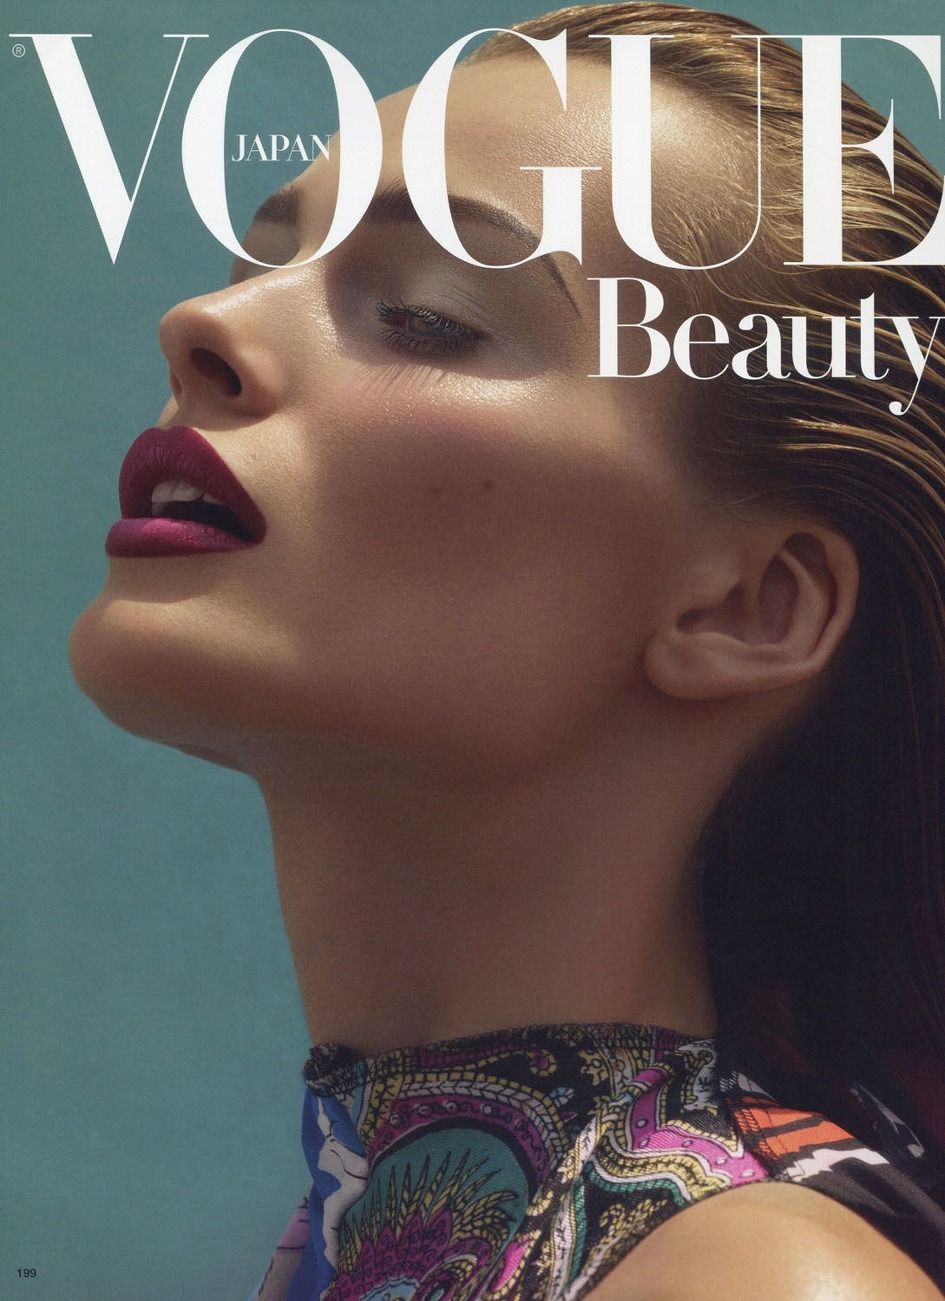 vogue-beauty-japan-this-soft-embrace-october-2011-1.jpg